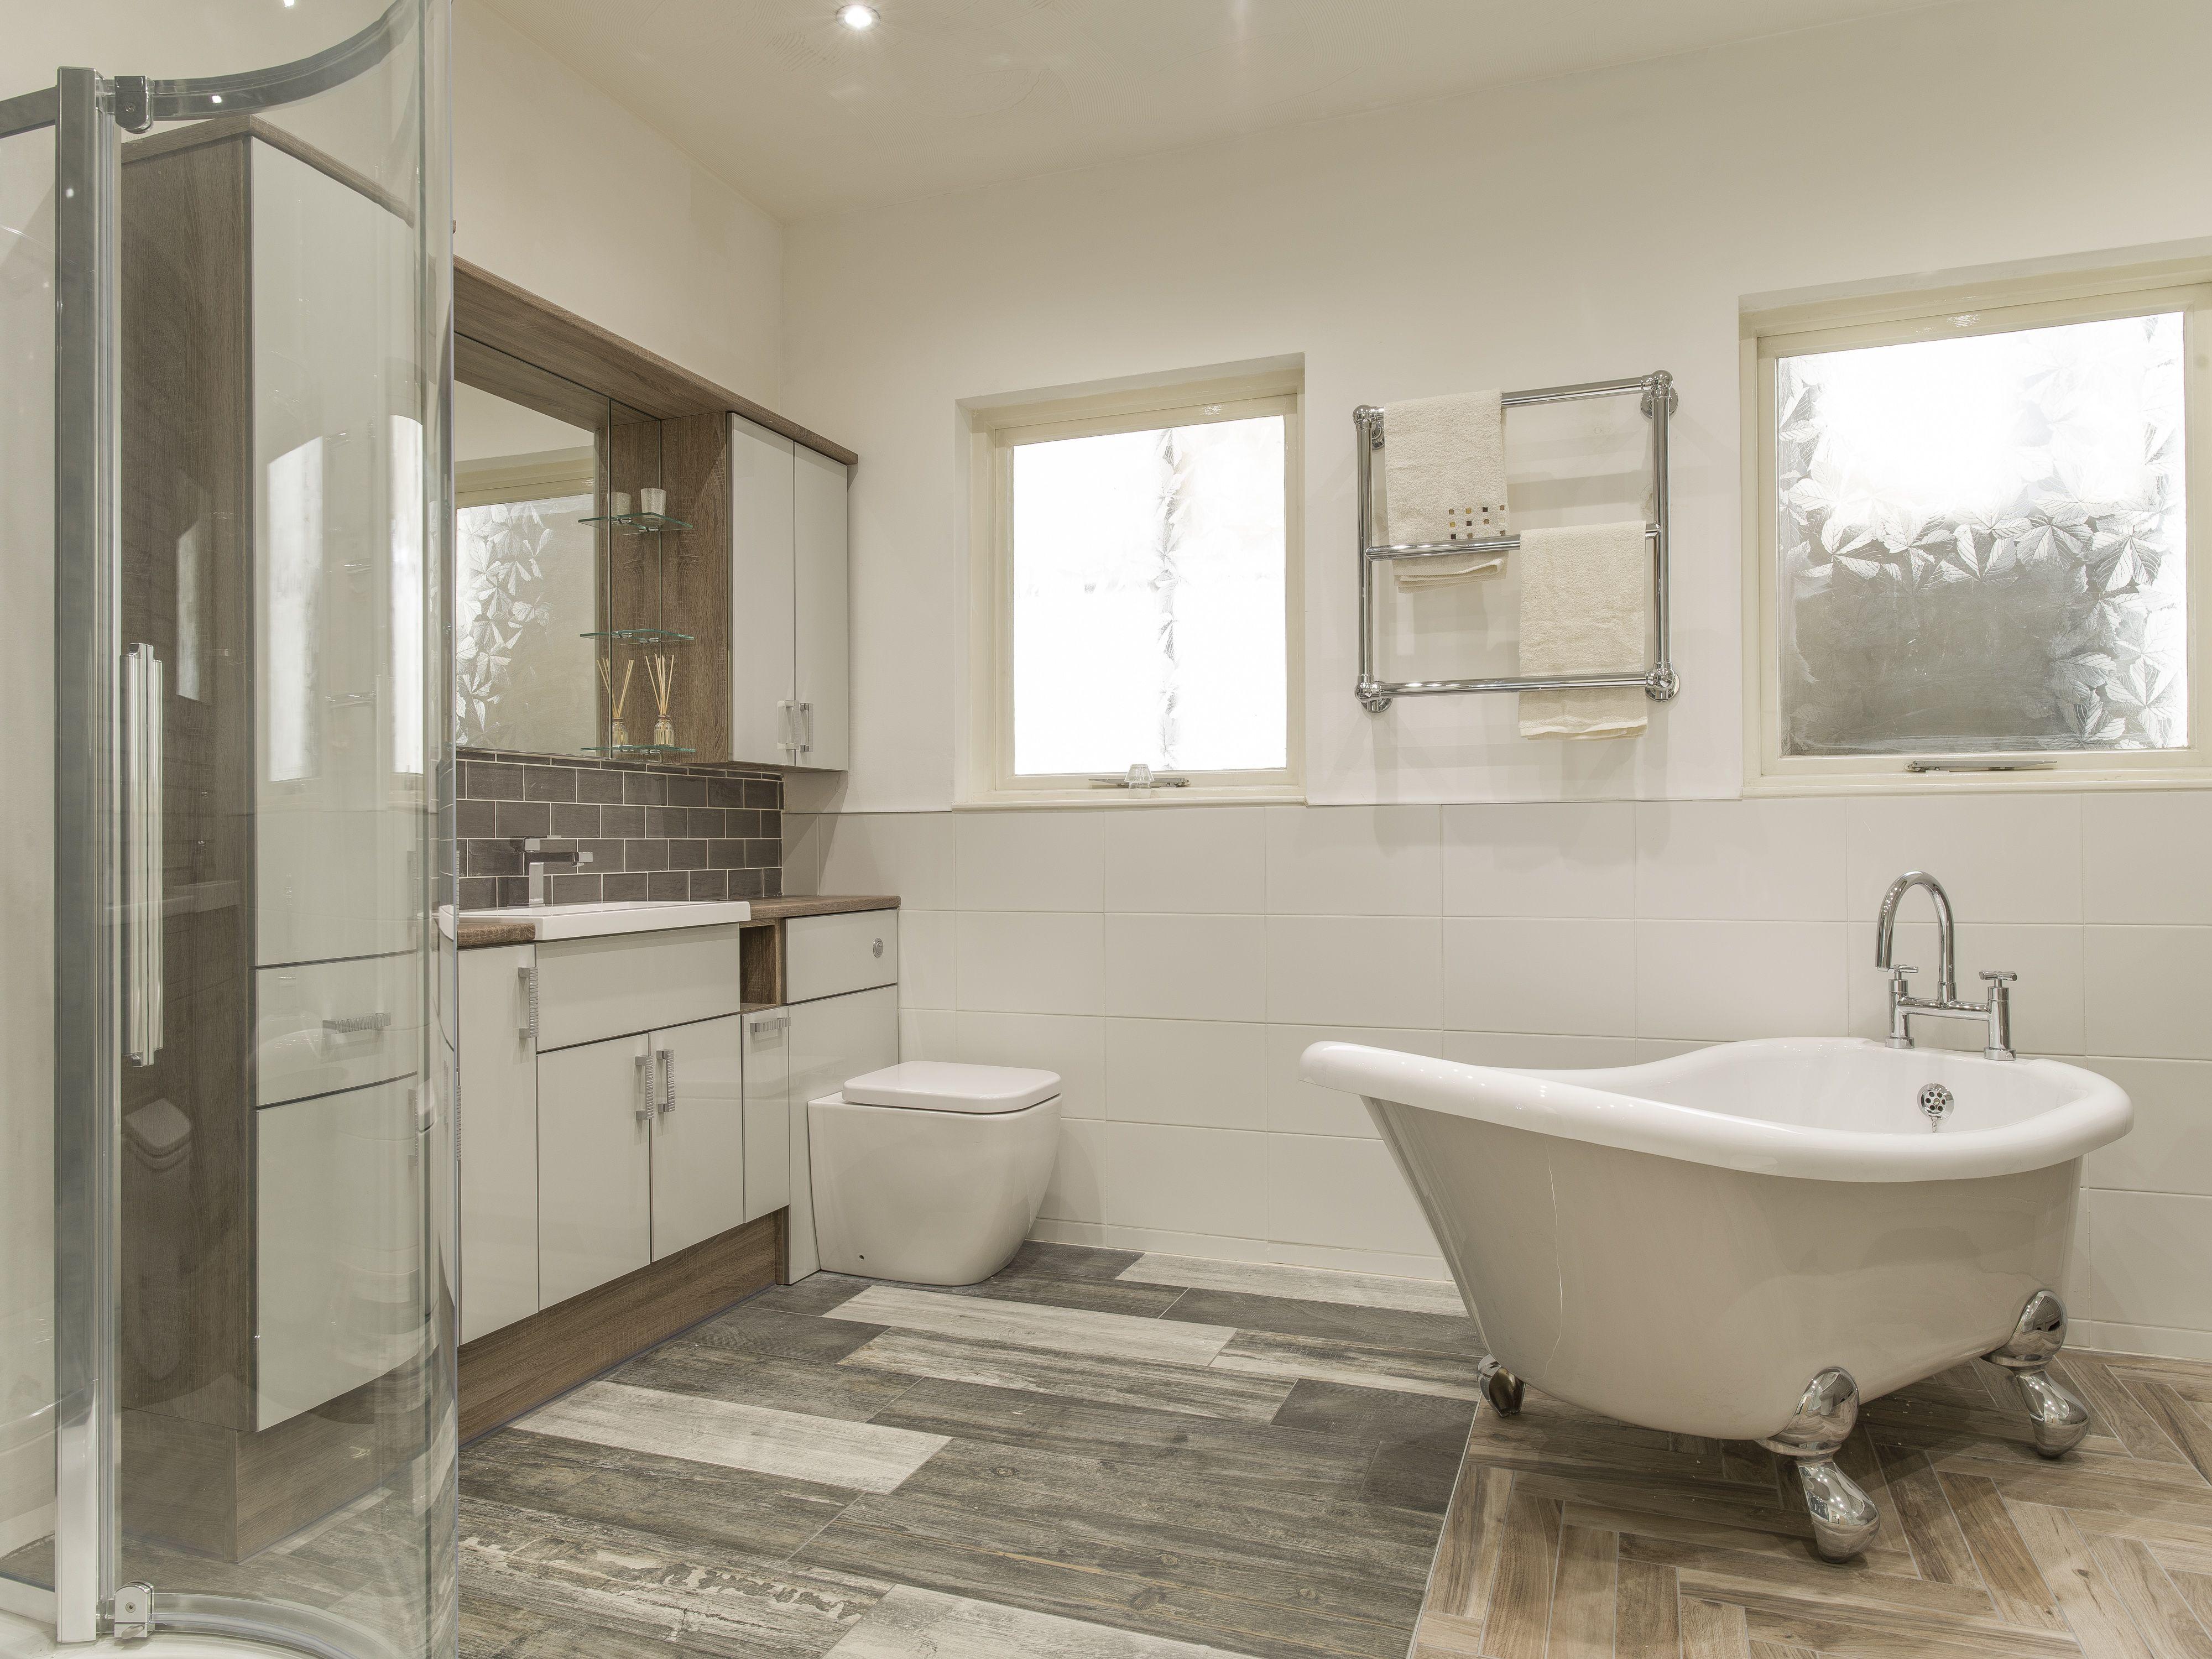 Buildbase Bathroom Showrooms | Our Showrooms: Bathrooms | Pinterest ...